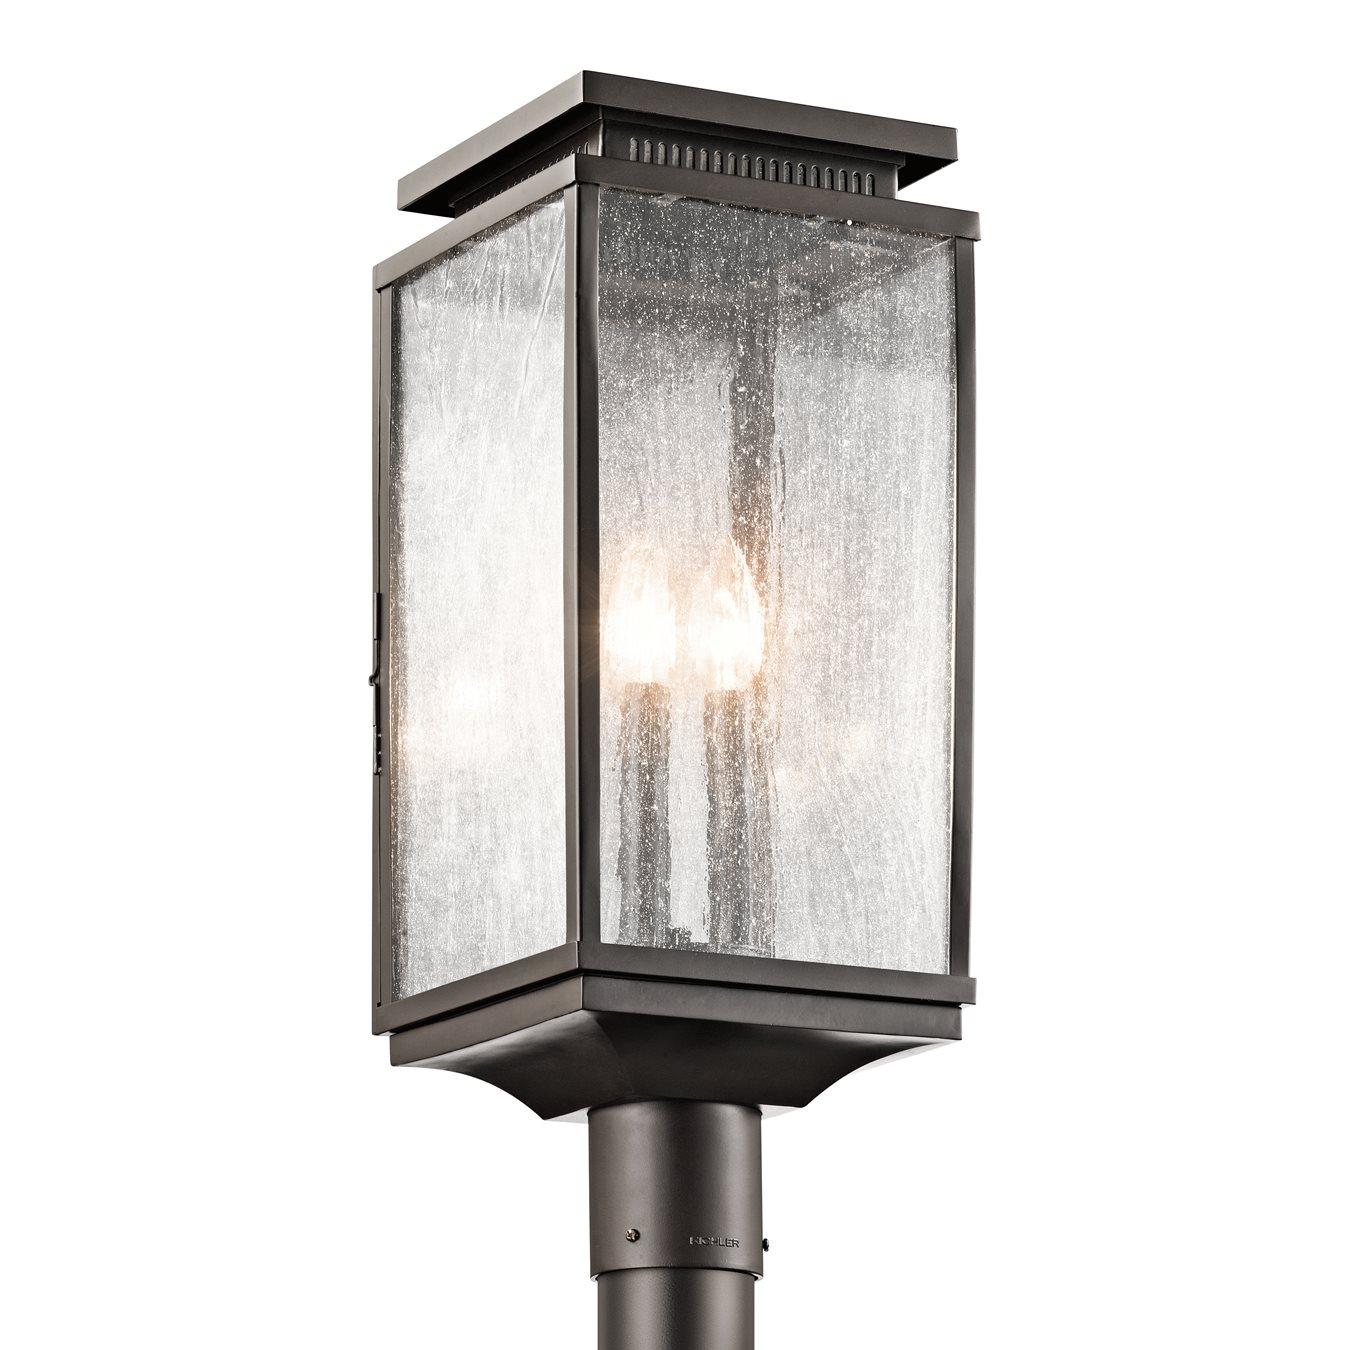 Kichler Lighting 49388Oz Manningham Outdoor Post Light | Lowe's Canada Pertaining To Outdoor Post Lights Kichler Lighting (View 4 of 15)